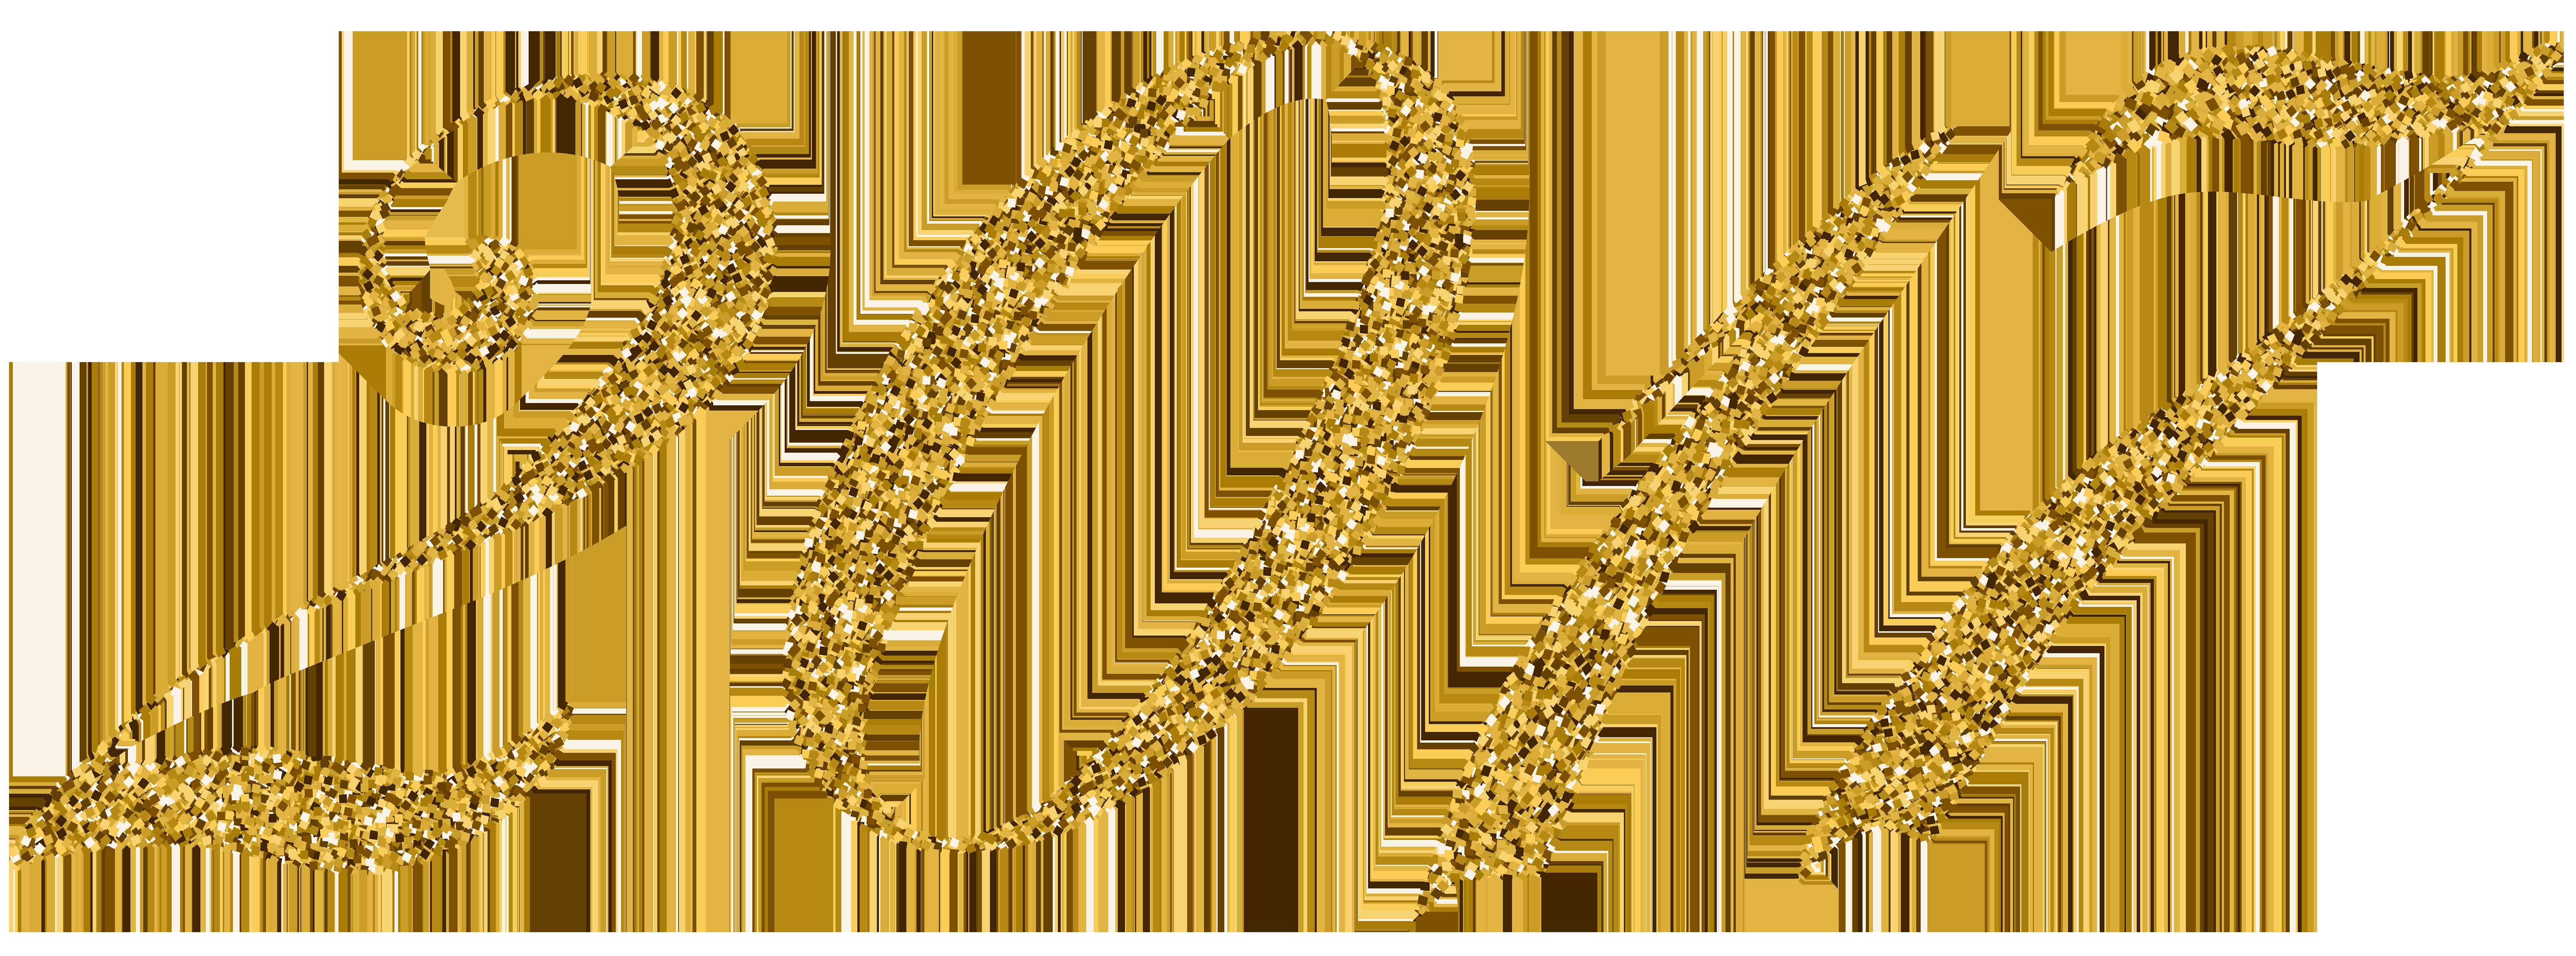 2017 Gold PNG Clip Art Image.